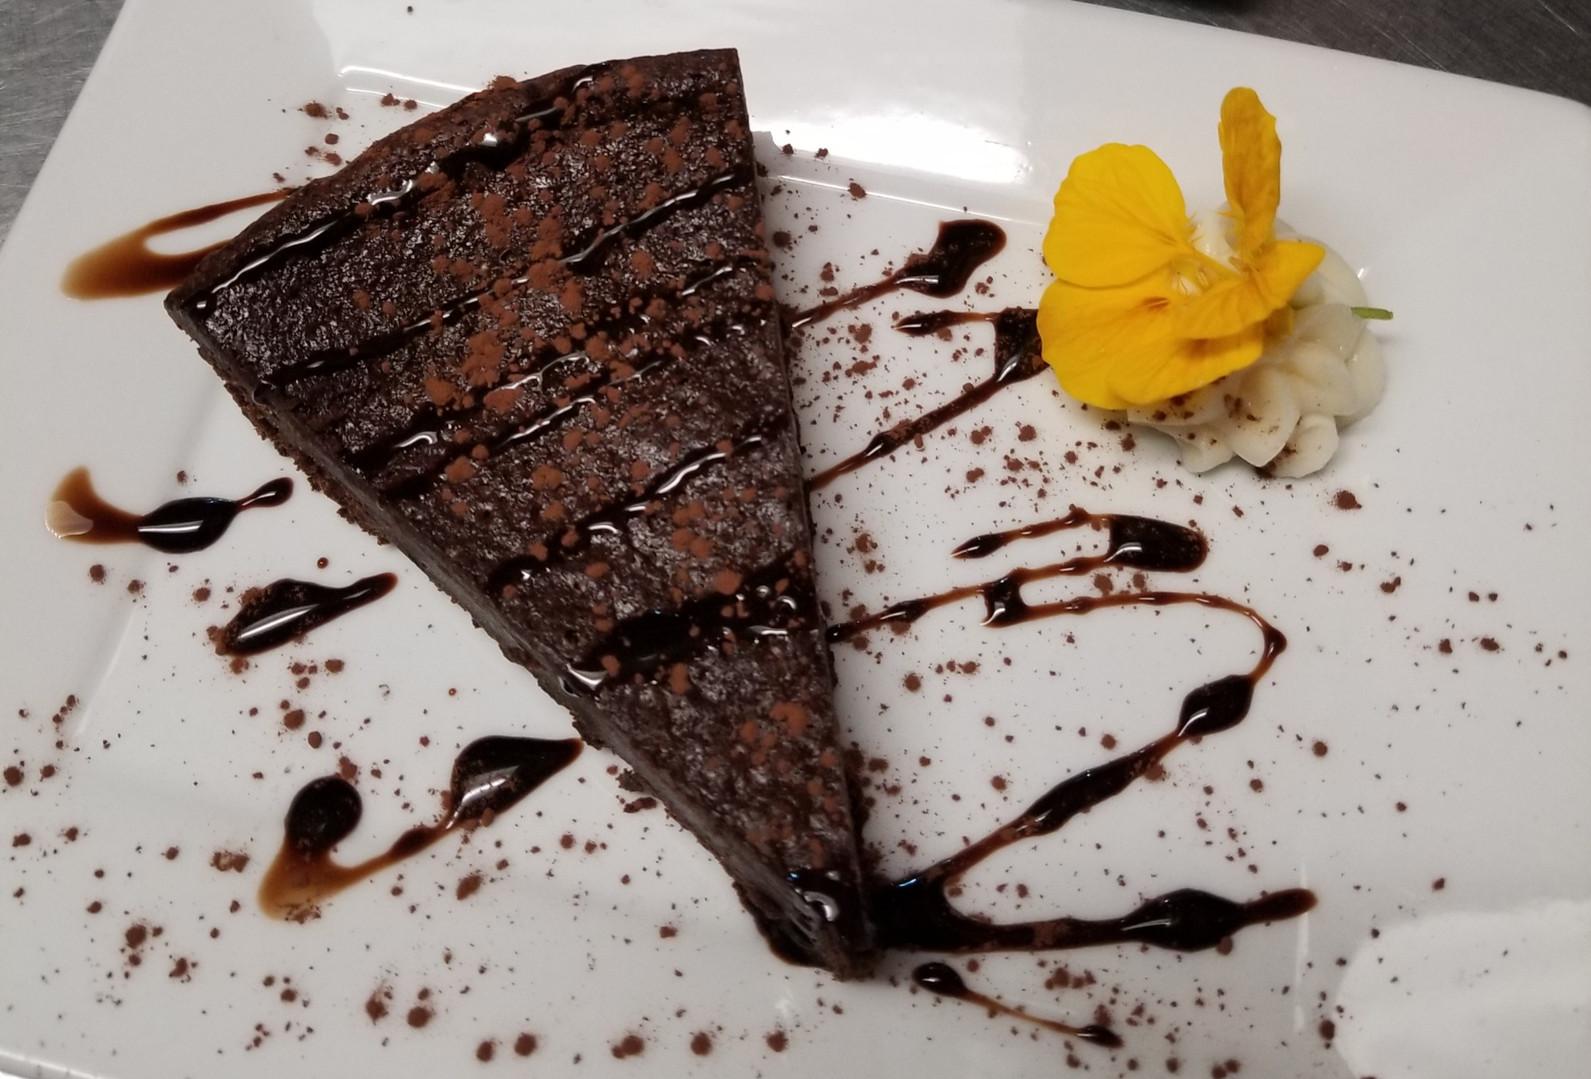 Chocolate Truffle Dessert